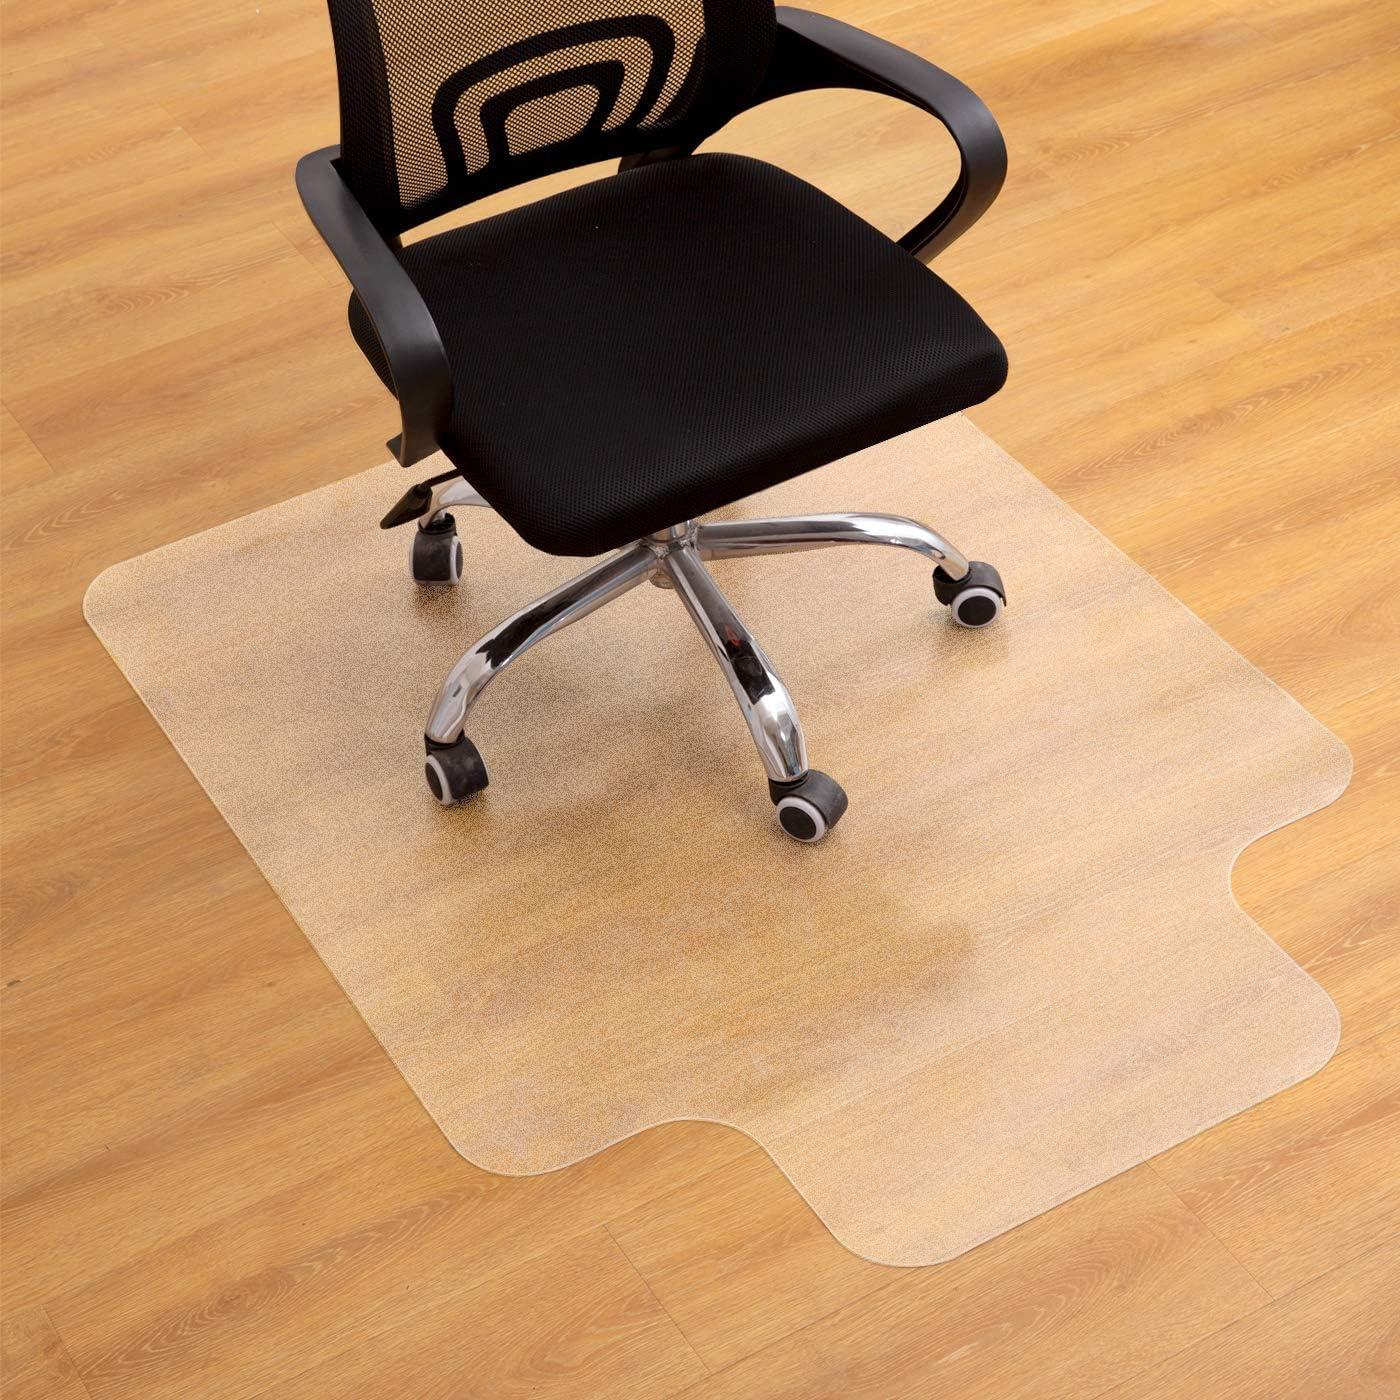 BesWin Office Chair Mat for Hard Floor - 30